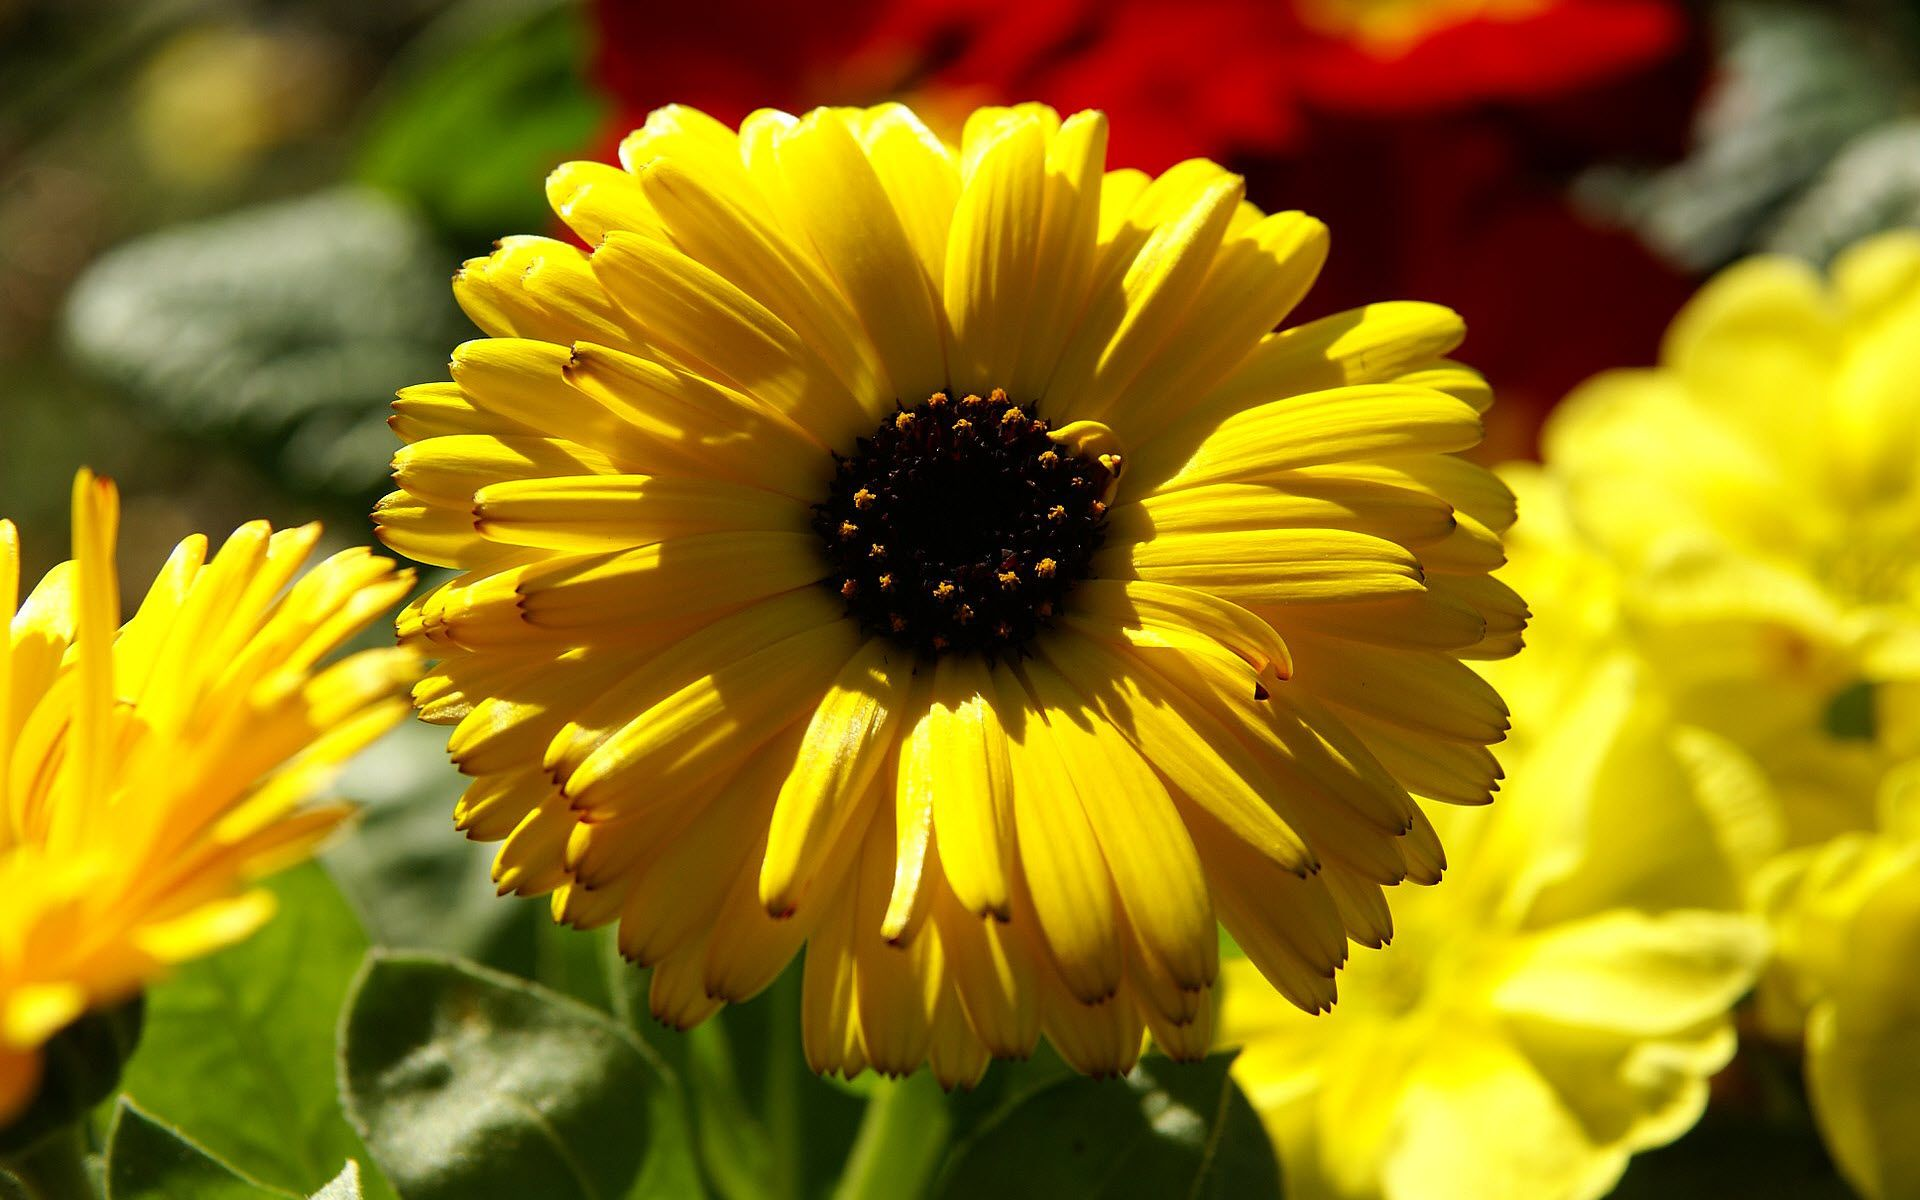 yellow_calendula_pot_marigold-wide.jpg (1920×1200)